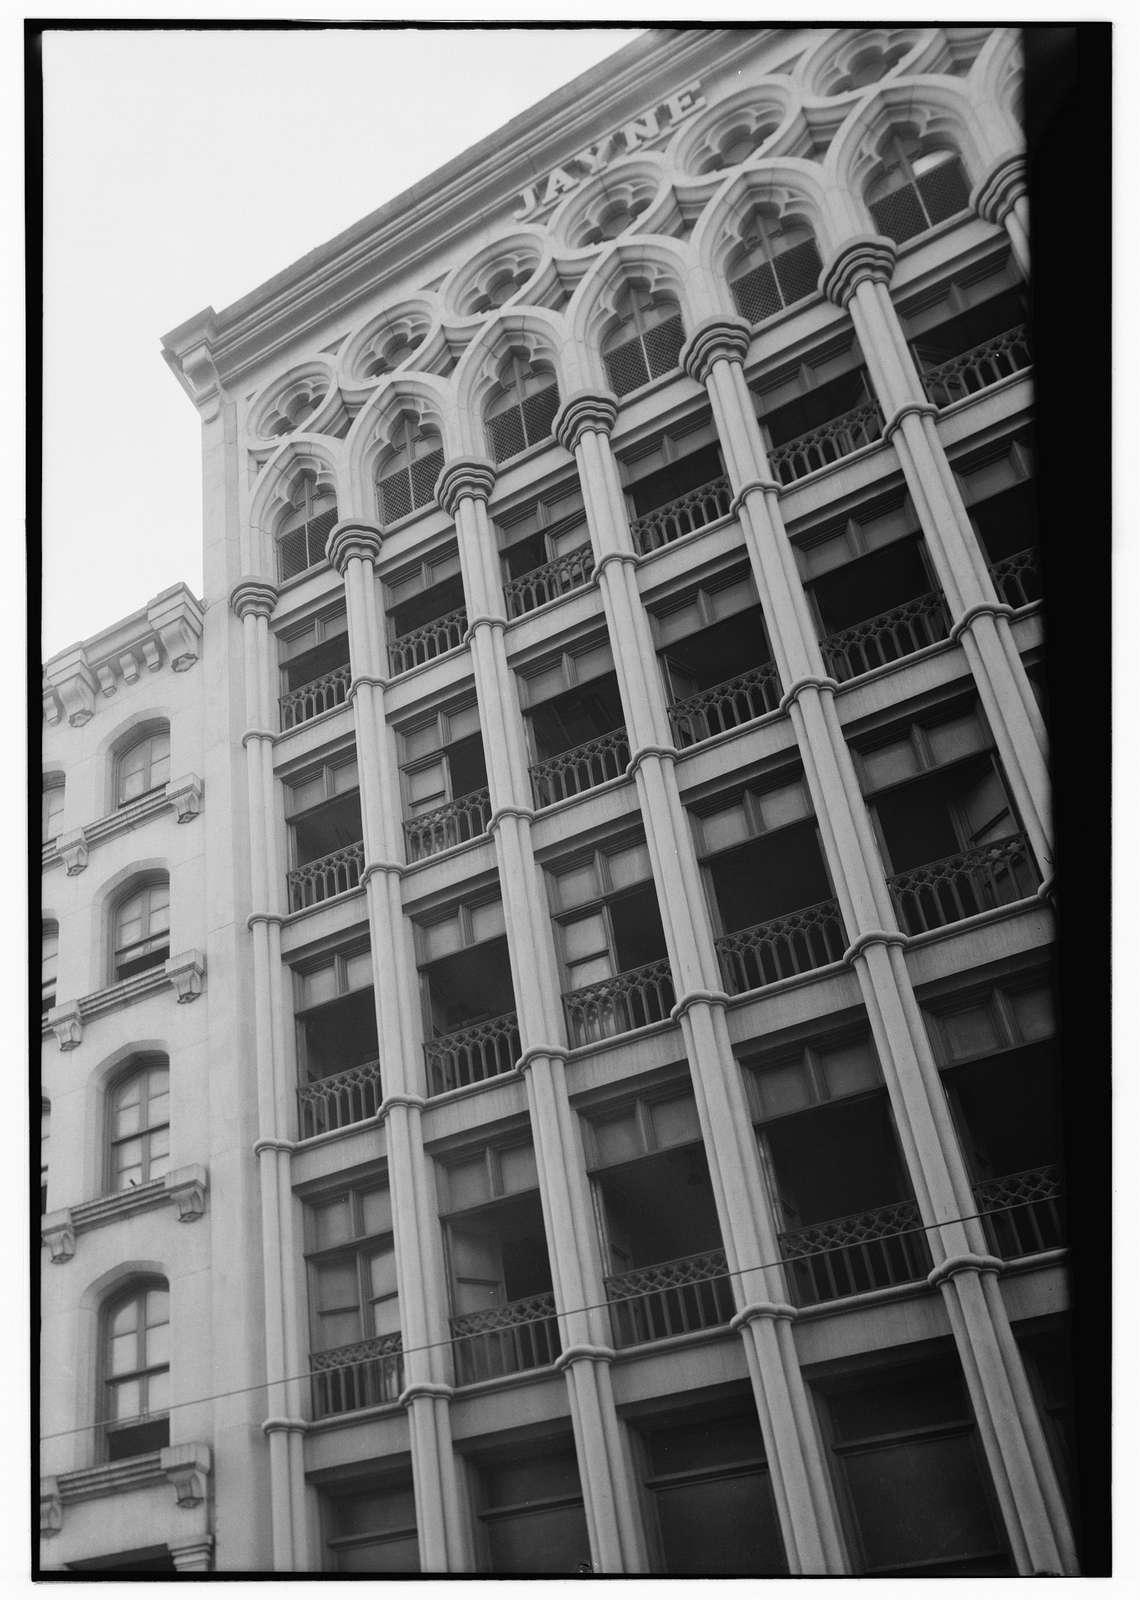 Jayne Building, 242-244 Chestnut Street, Philadelphia, Philadelphia County, PA